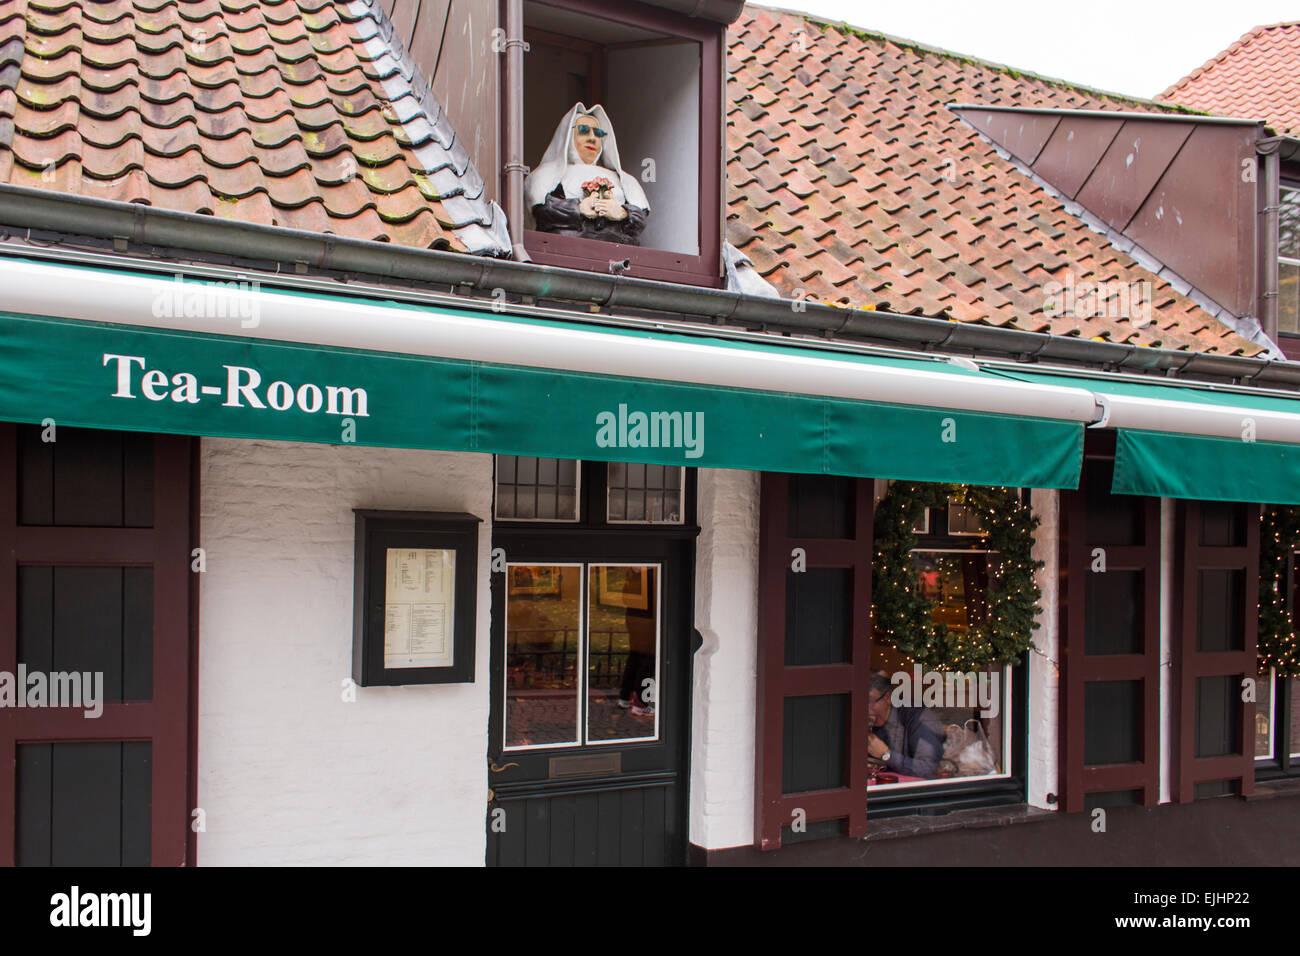 Dummy woman looking from window of tea room, Bruges, Belgium - Stock Image